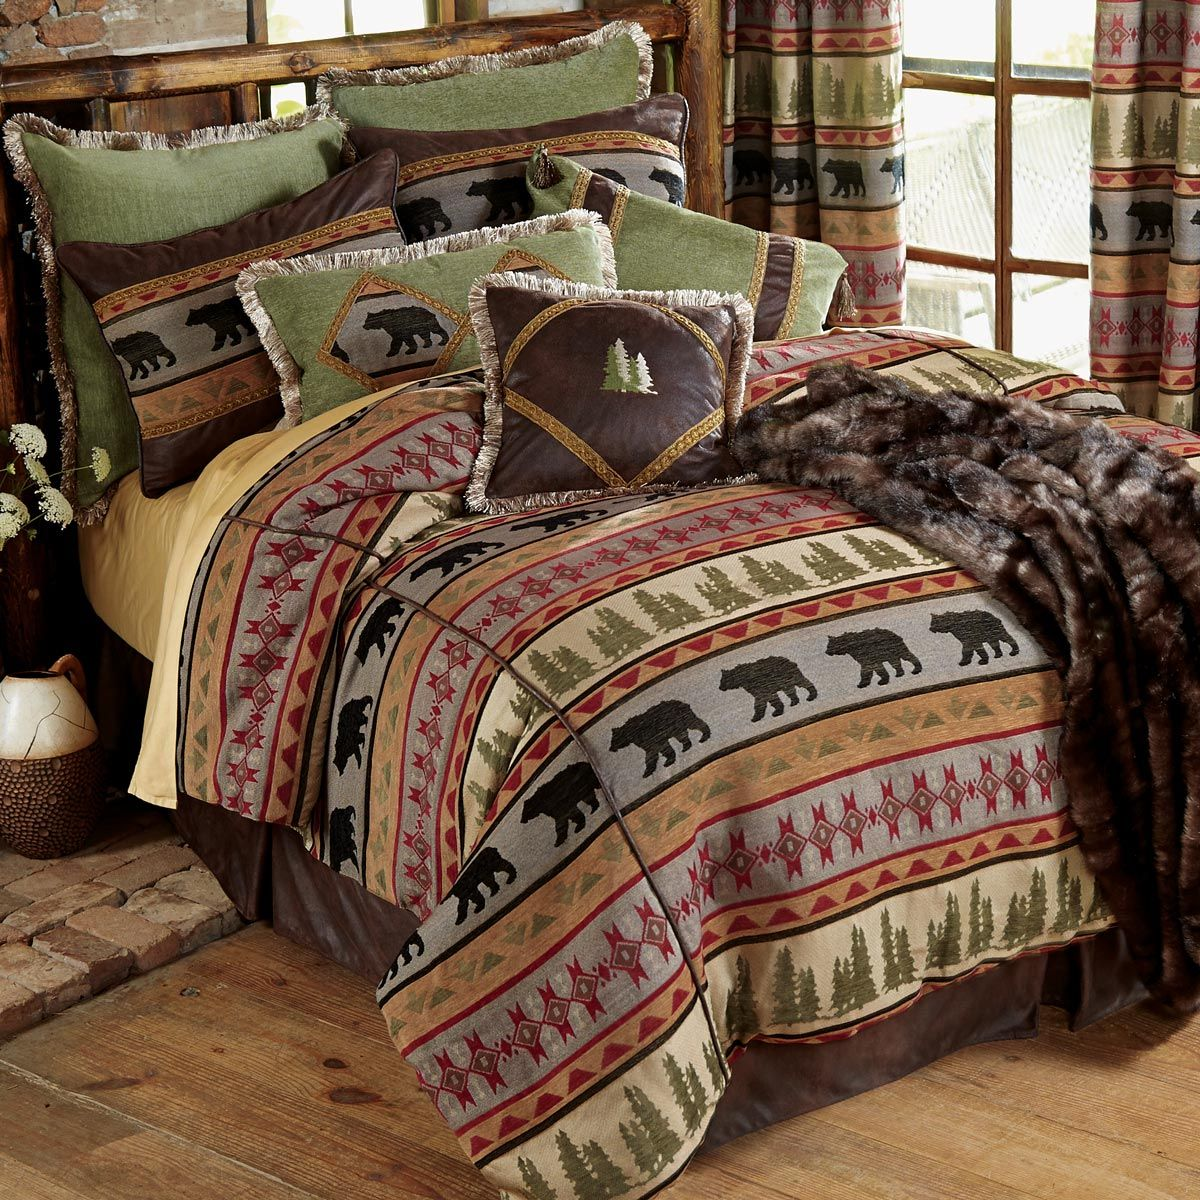 Rustic Bedding & Cabin Bedding - Black Forest Decor ...